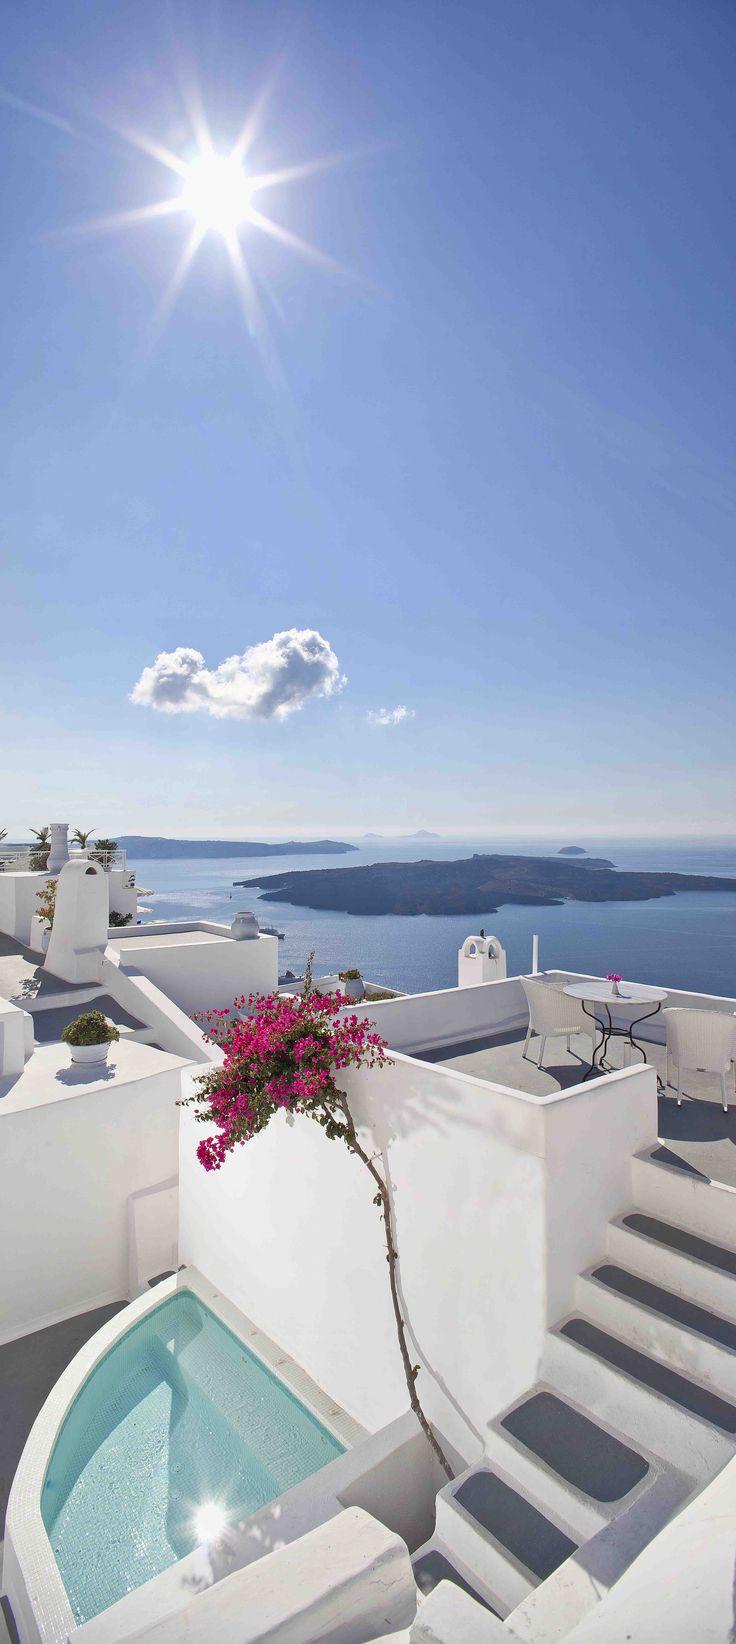 CLIFF SIDE SUITES SANTORINI  http://www.cliffside.gr